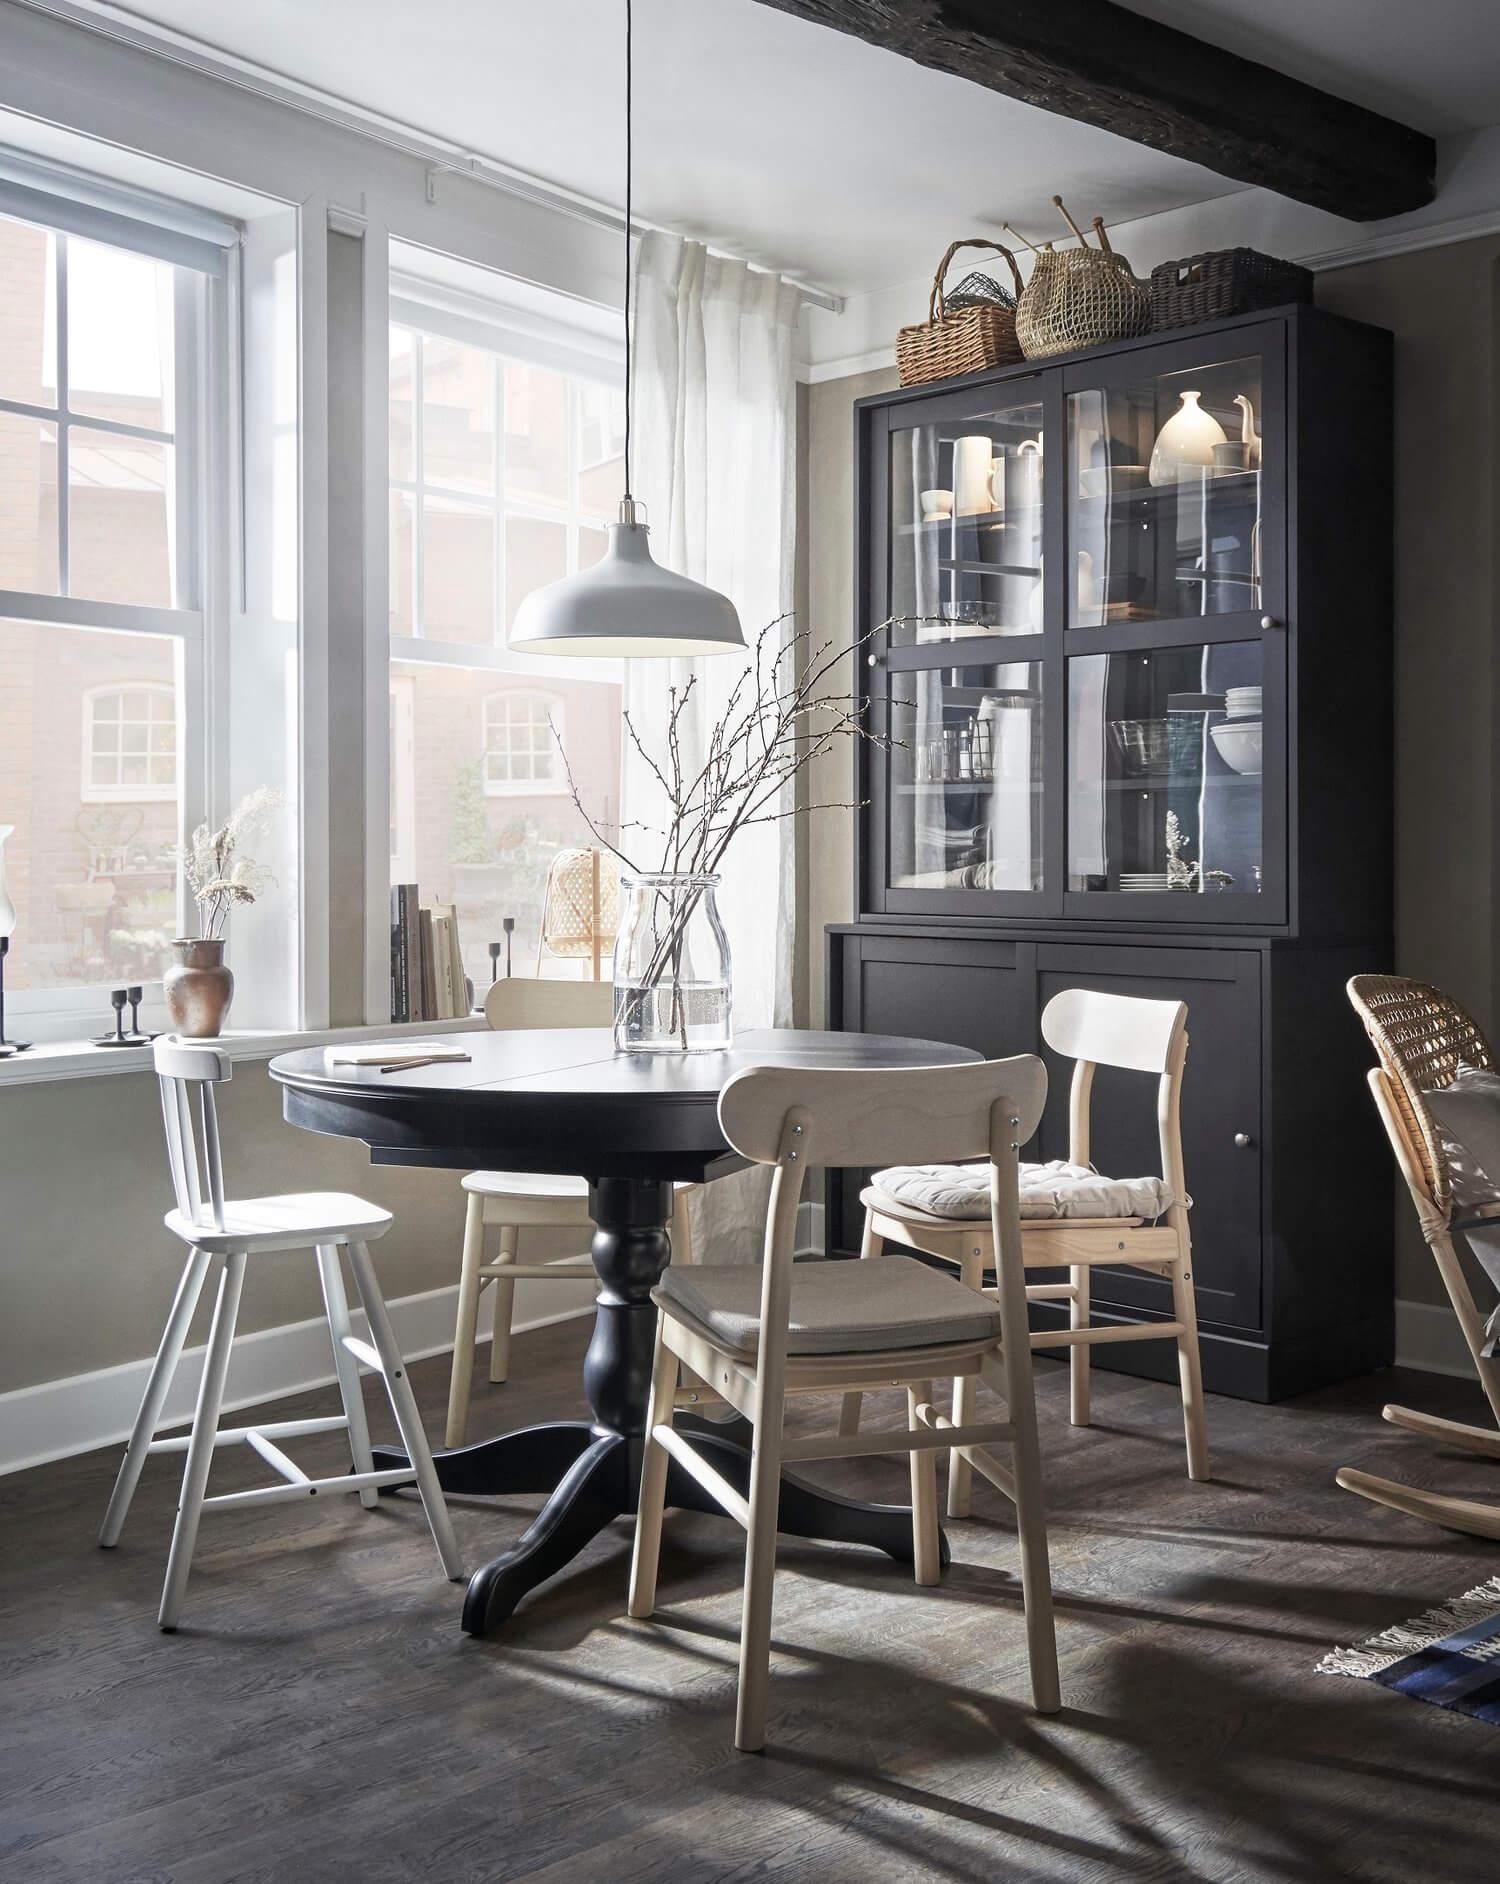 IKEA Catalog 2020: Get Ready For A Fresh Start